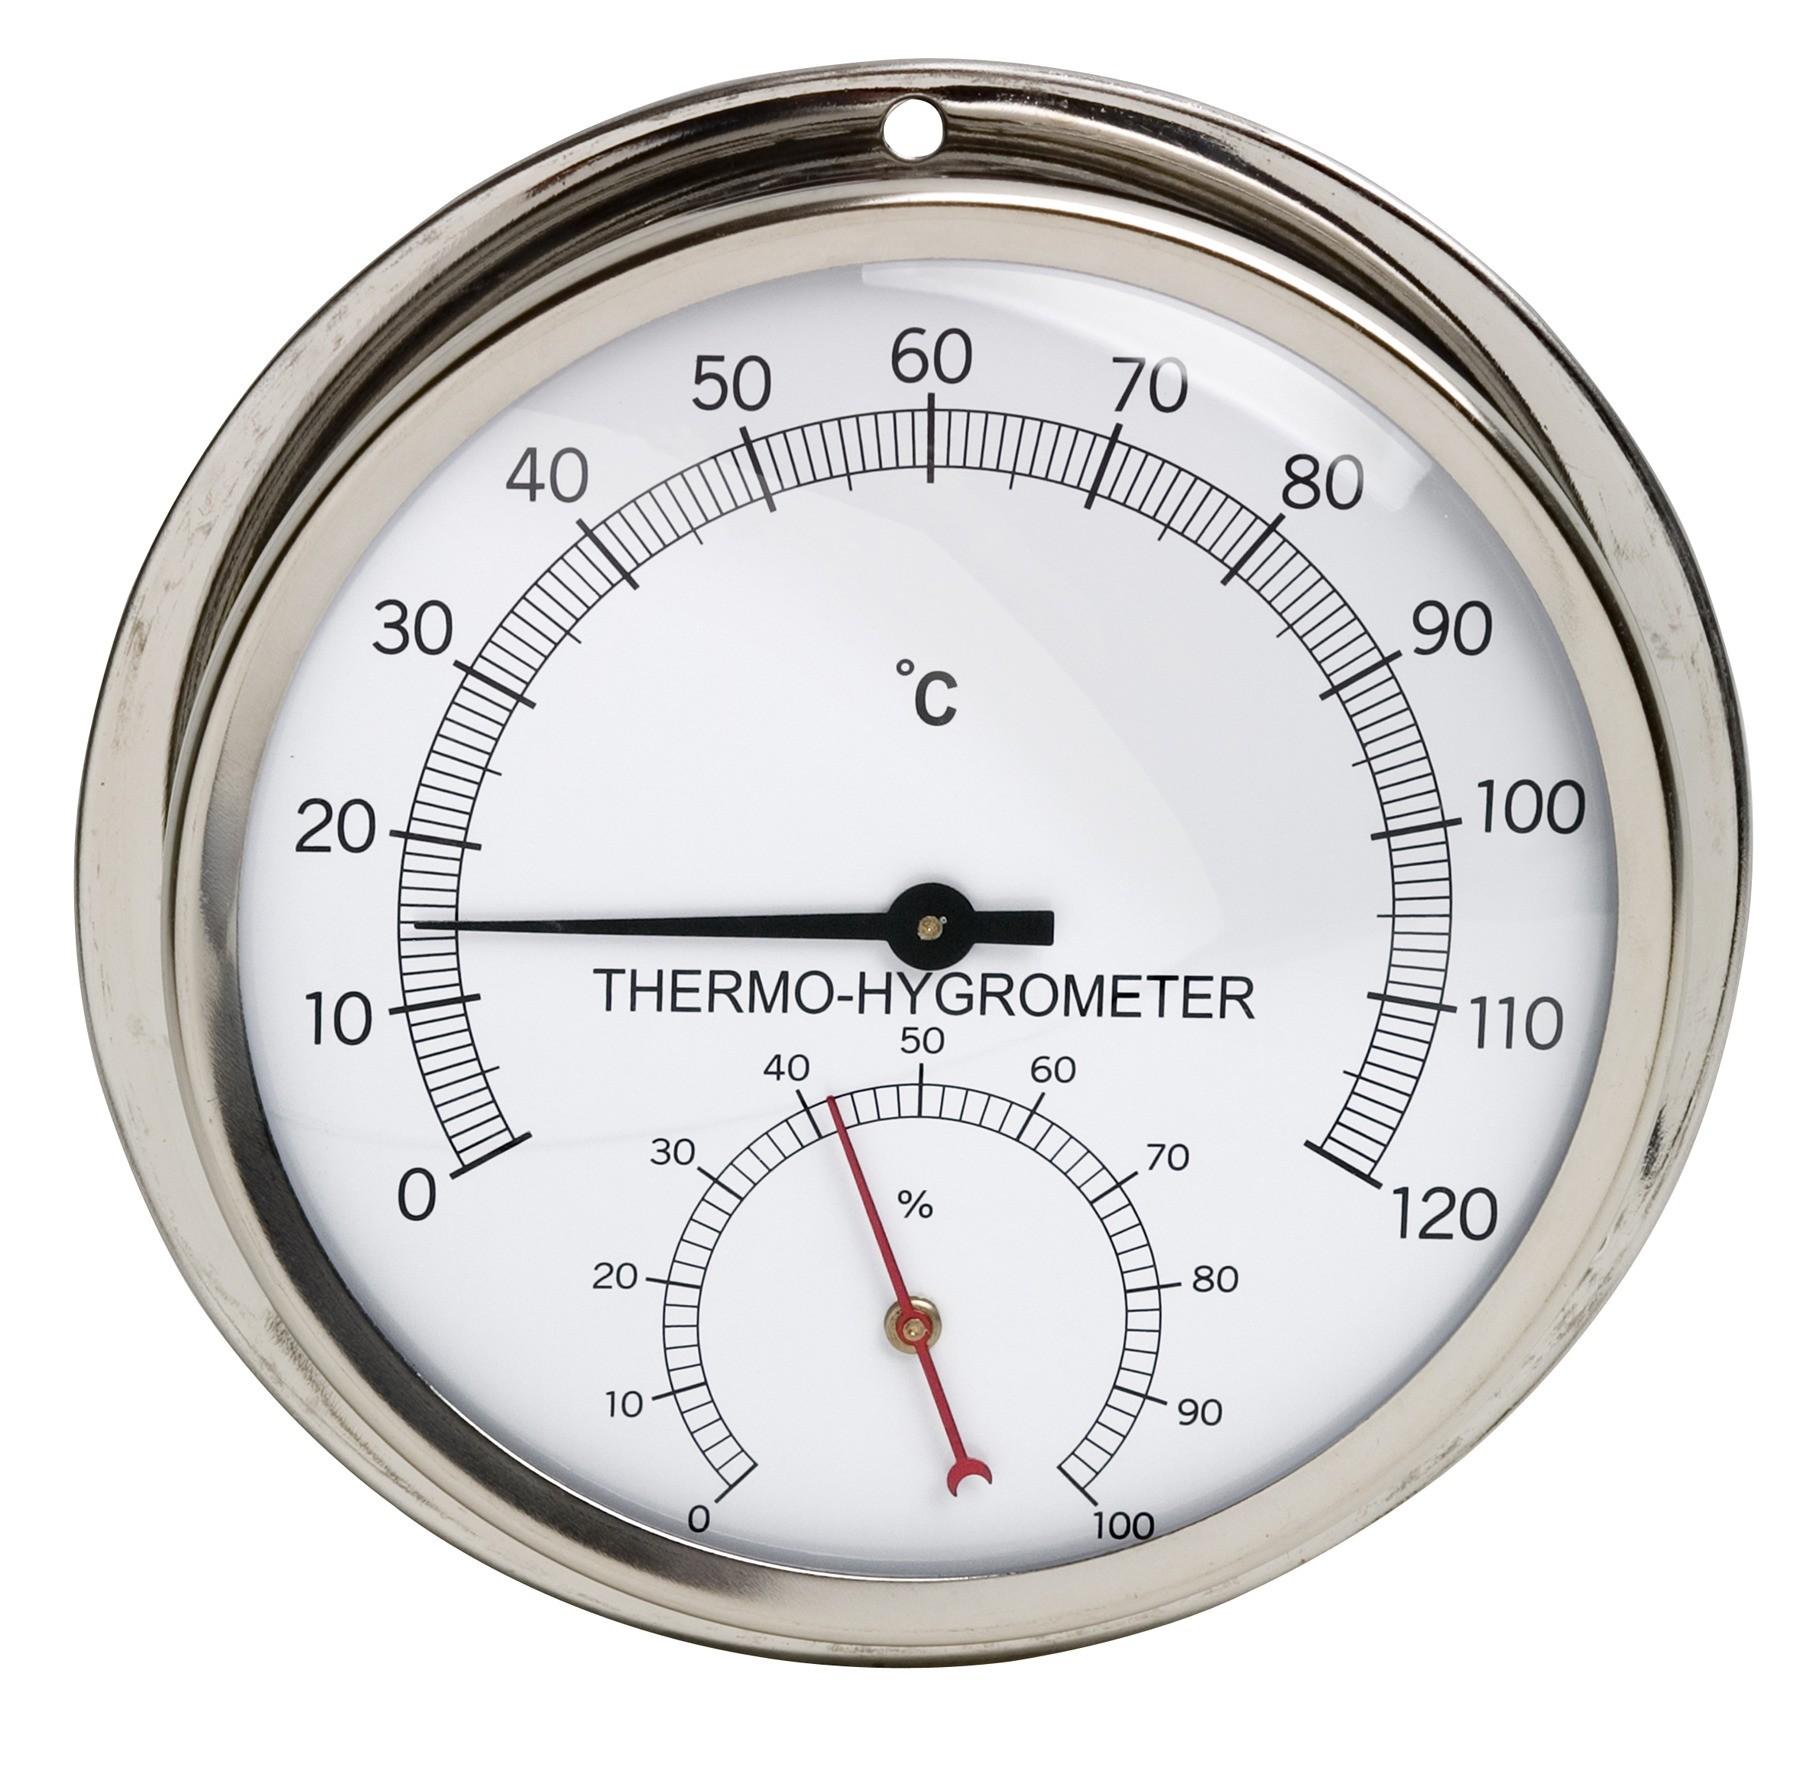 H-B DURAC Thermometer-Hygrometer